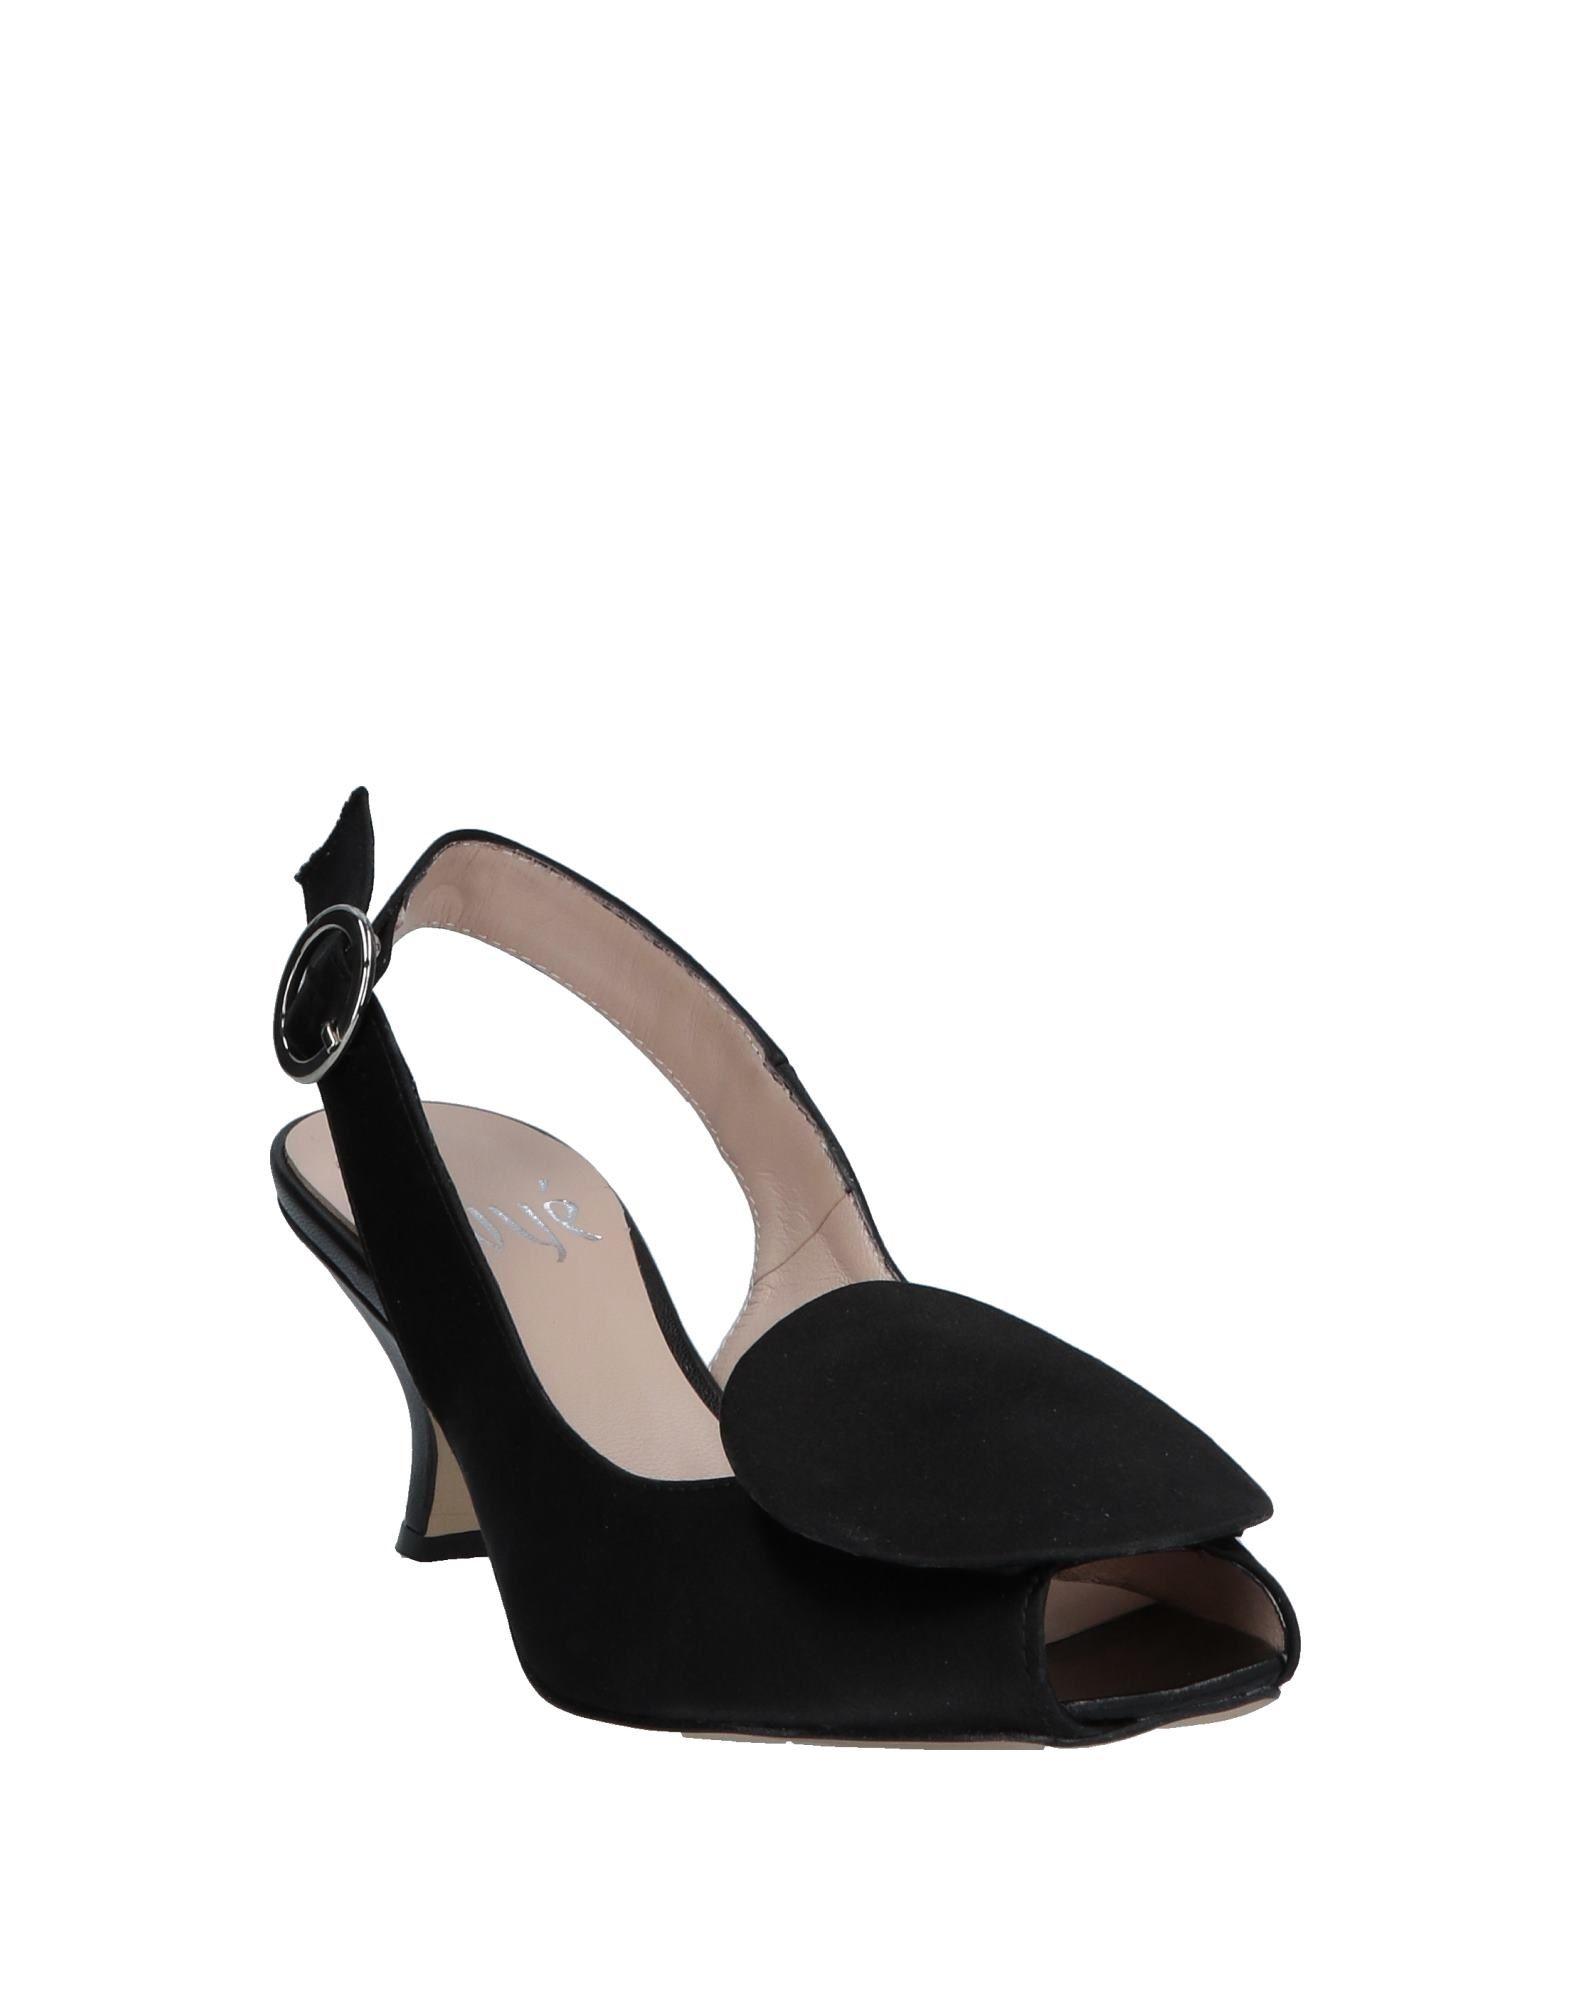 Ovye' By Cristina Qualität Lucchi Pumps Damen  11569373VW Gute Qualität Cristina beliebte Schuhe e4bd60